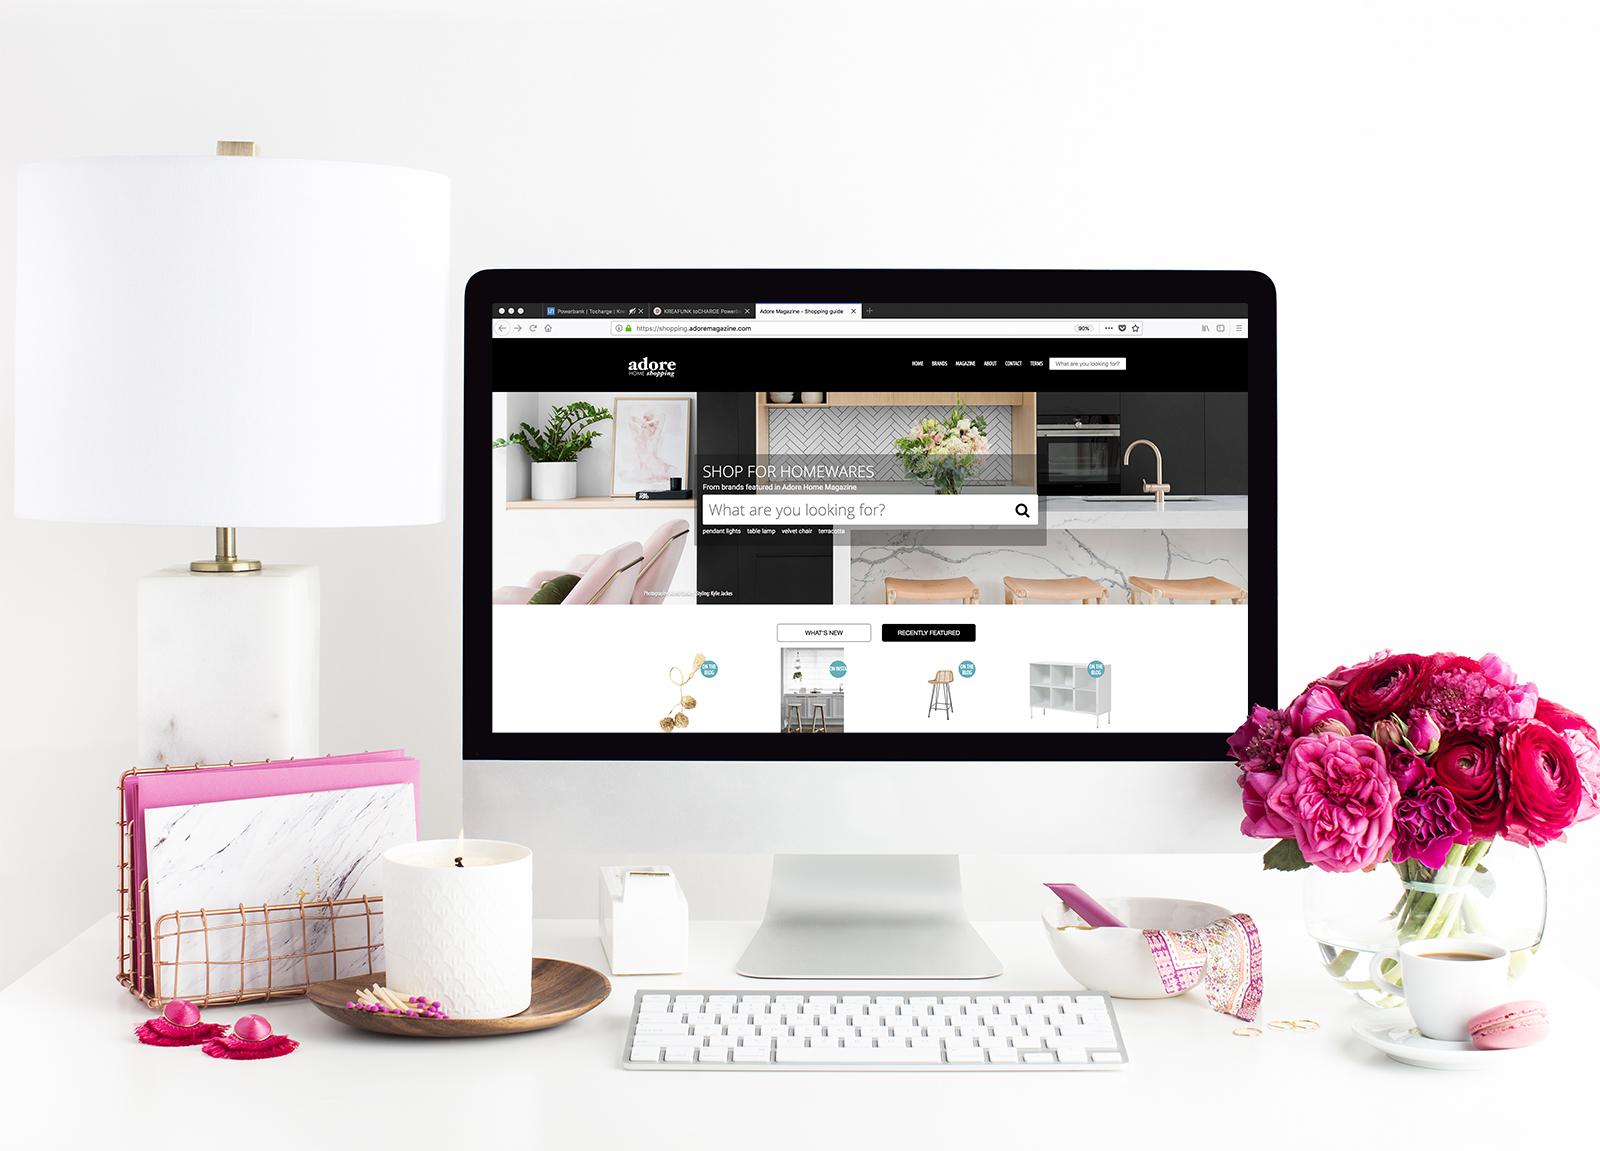 adore_shopping_site.jpg